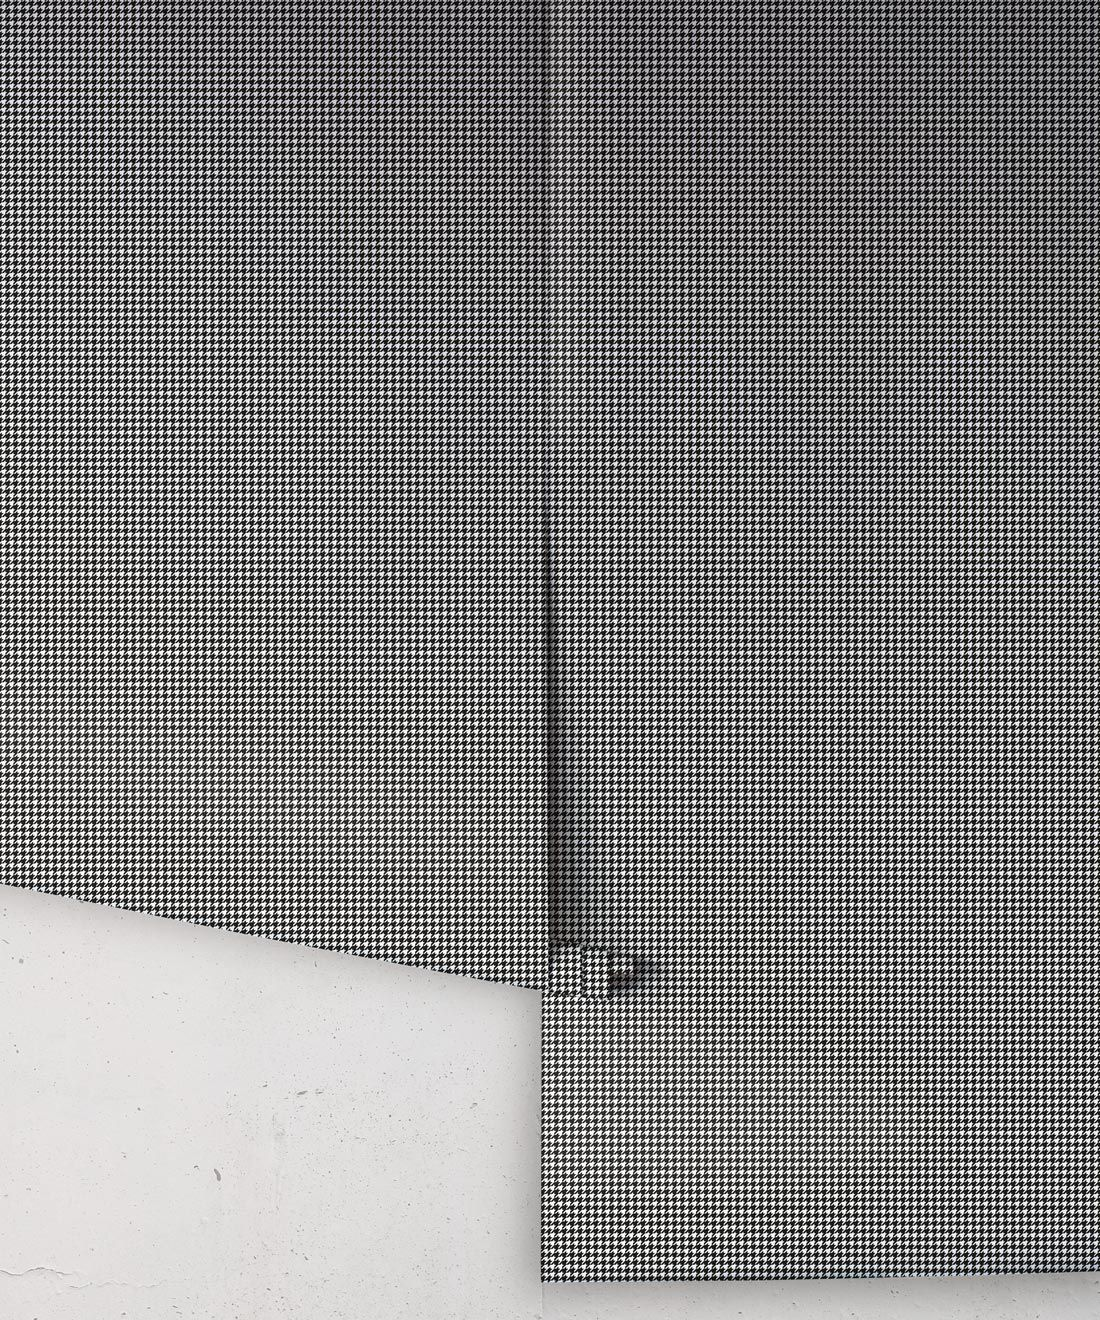 Houndstooth Wallpaper • Dogstooth Wallpaper • Black & White •Rolls